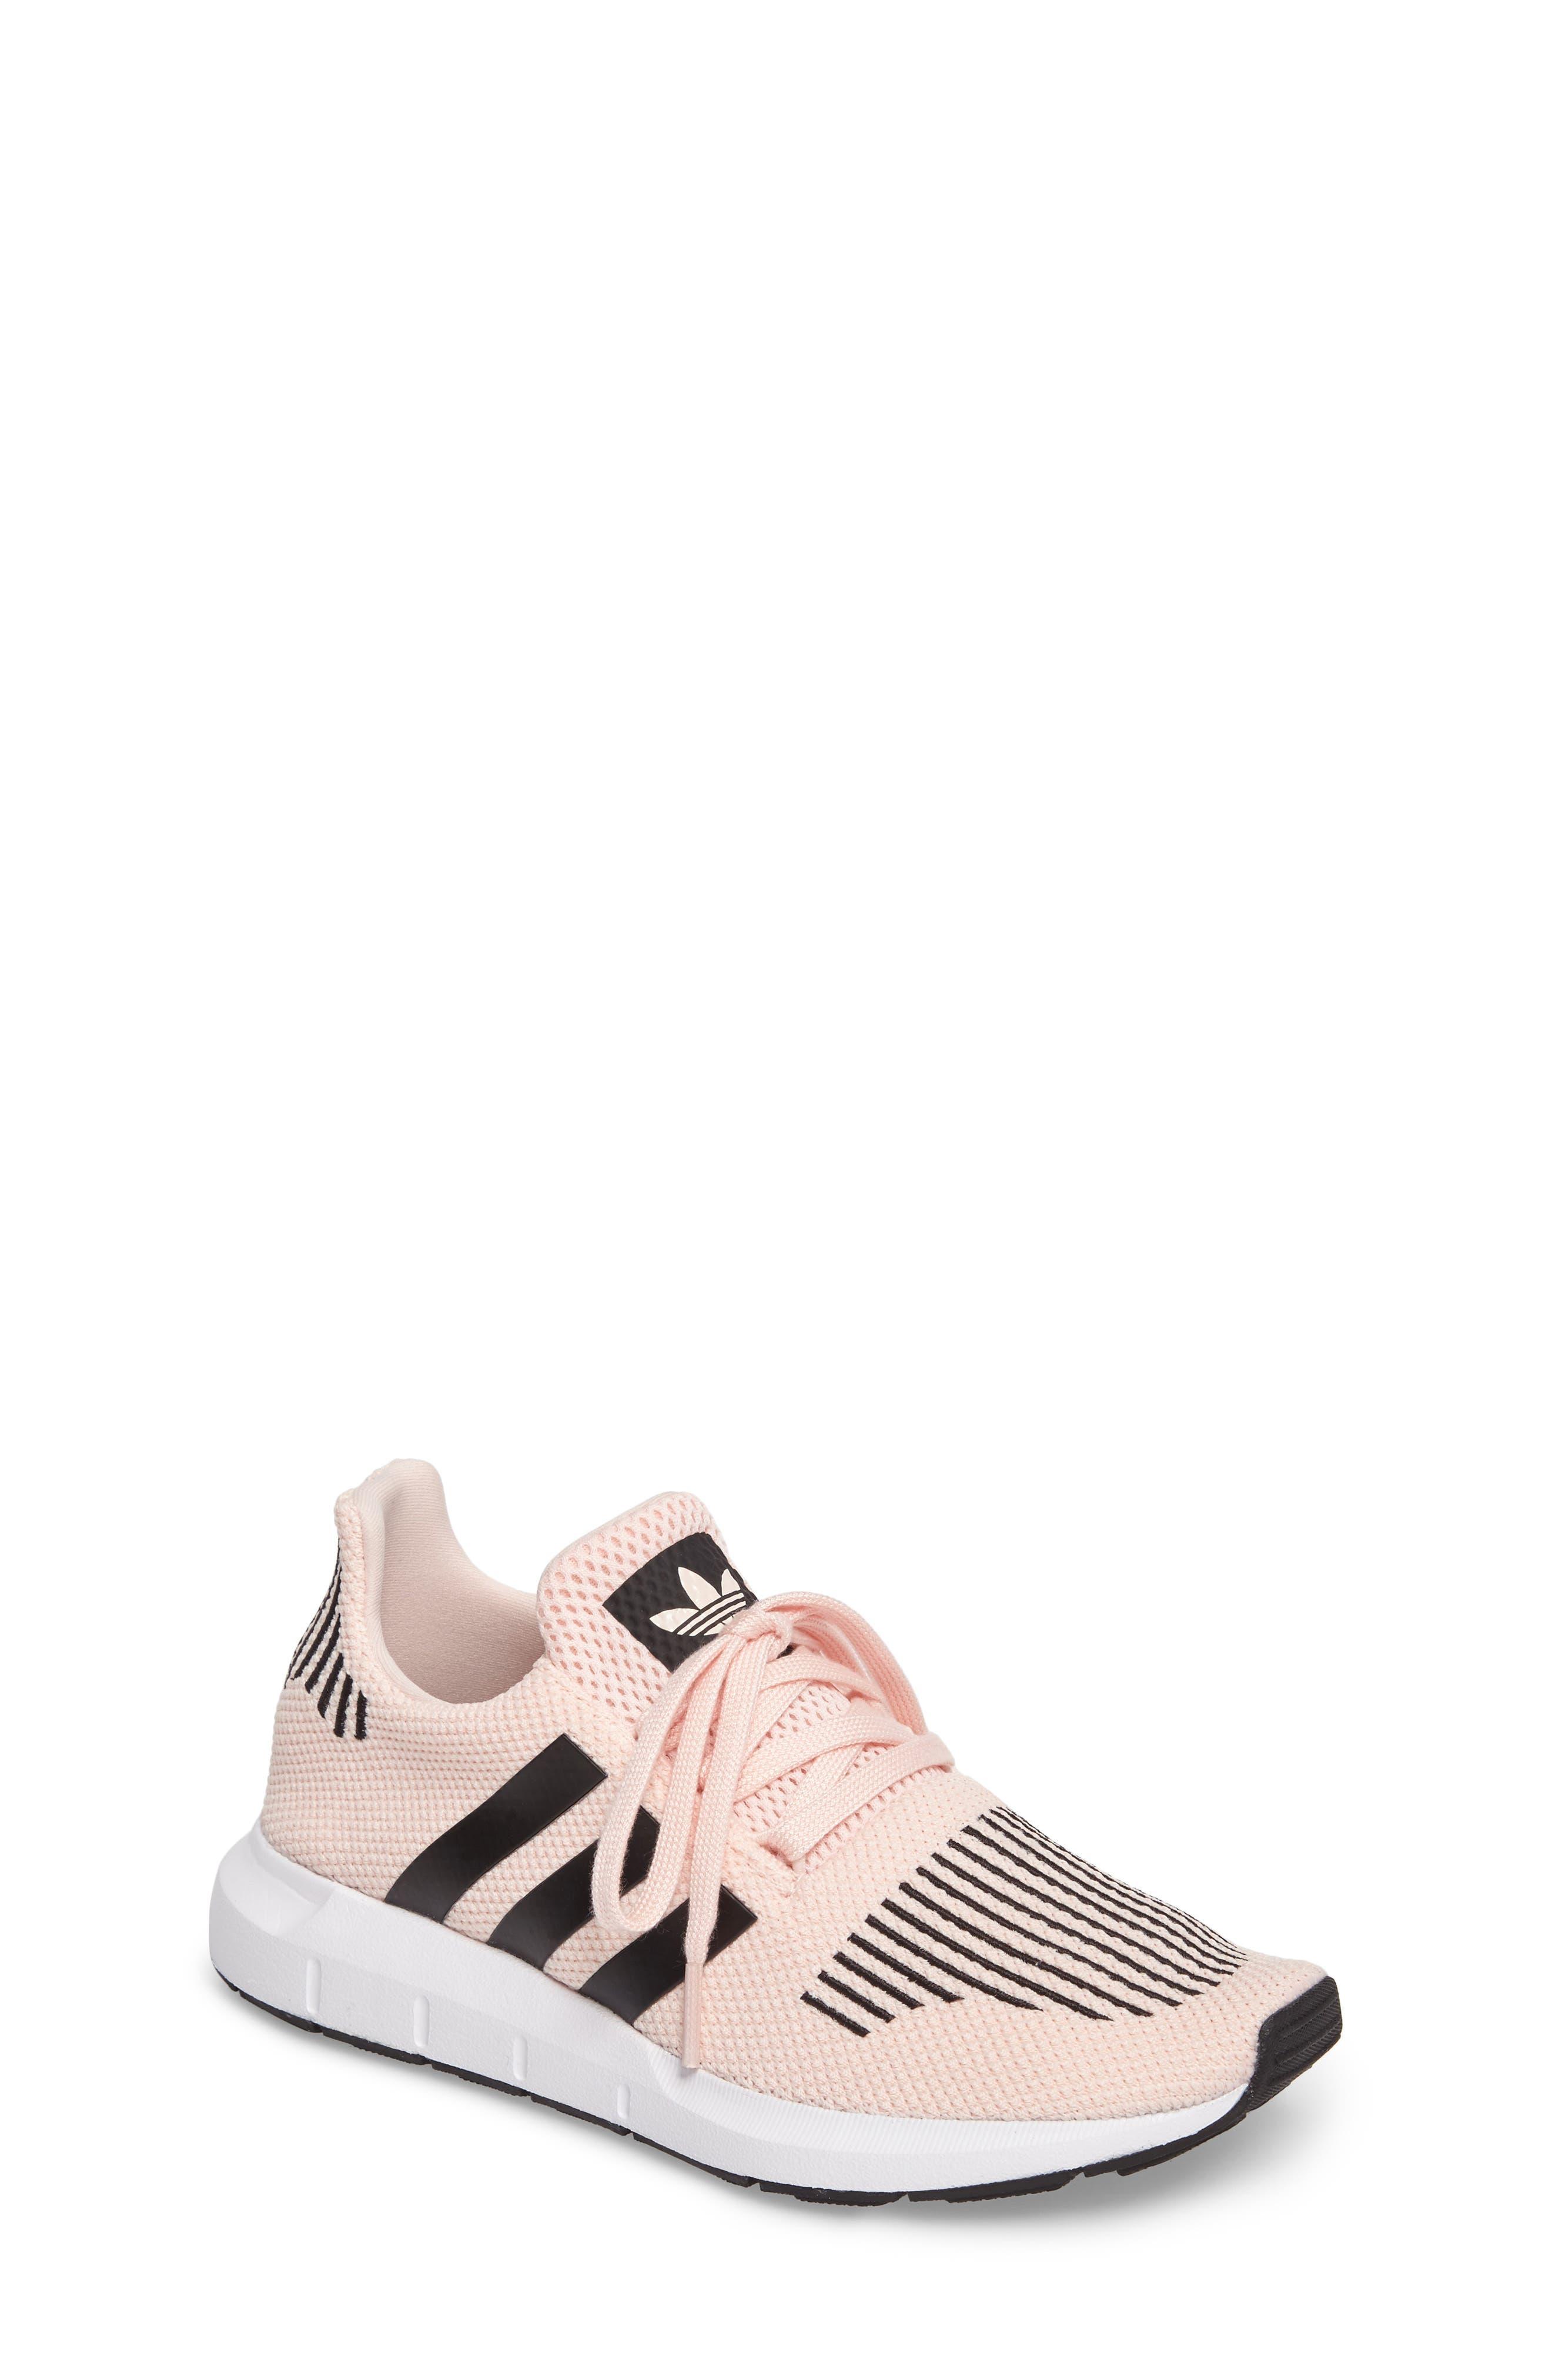 Alternate Image 1 Selected - adidas Swift Run J Sneaker (Baby, Walker, Toddler, Little Kid & Big Kid)